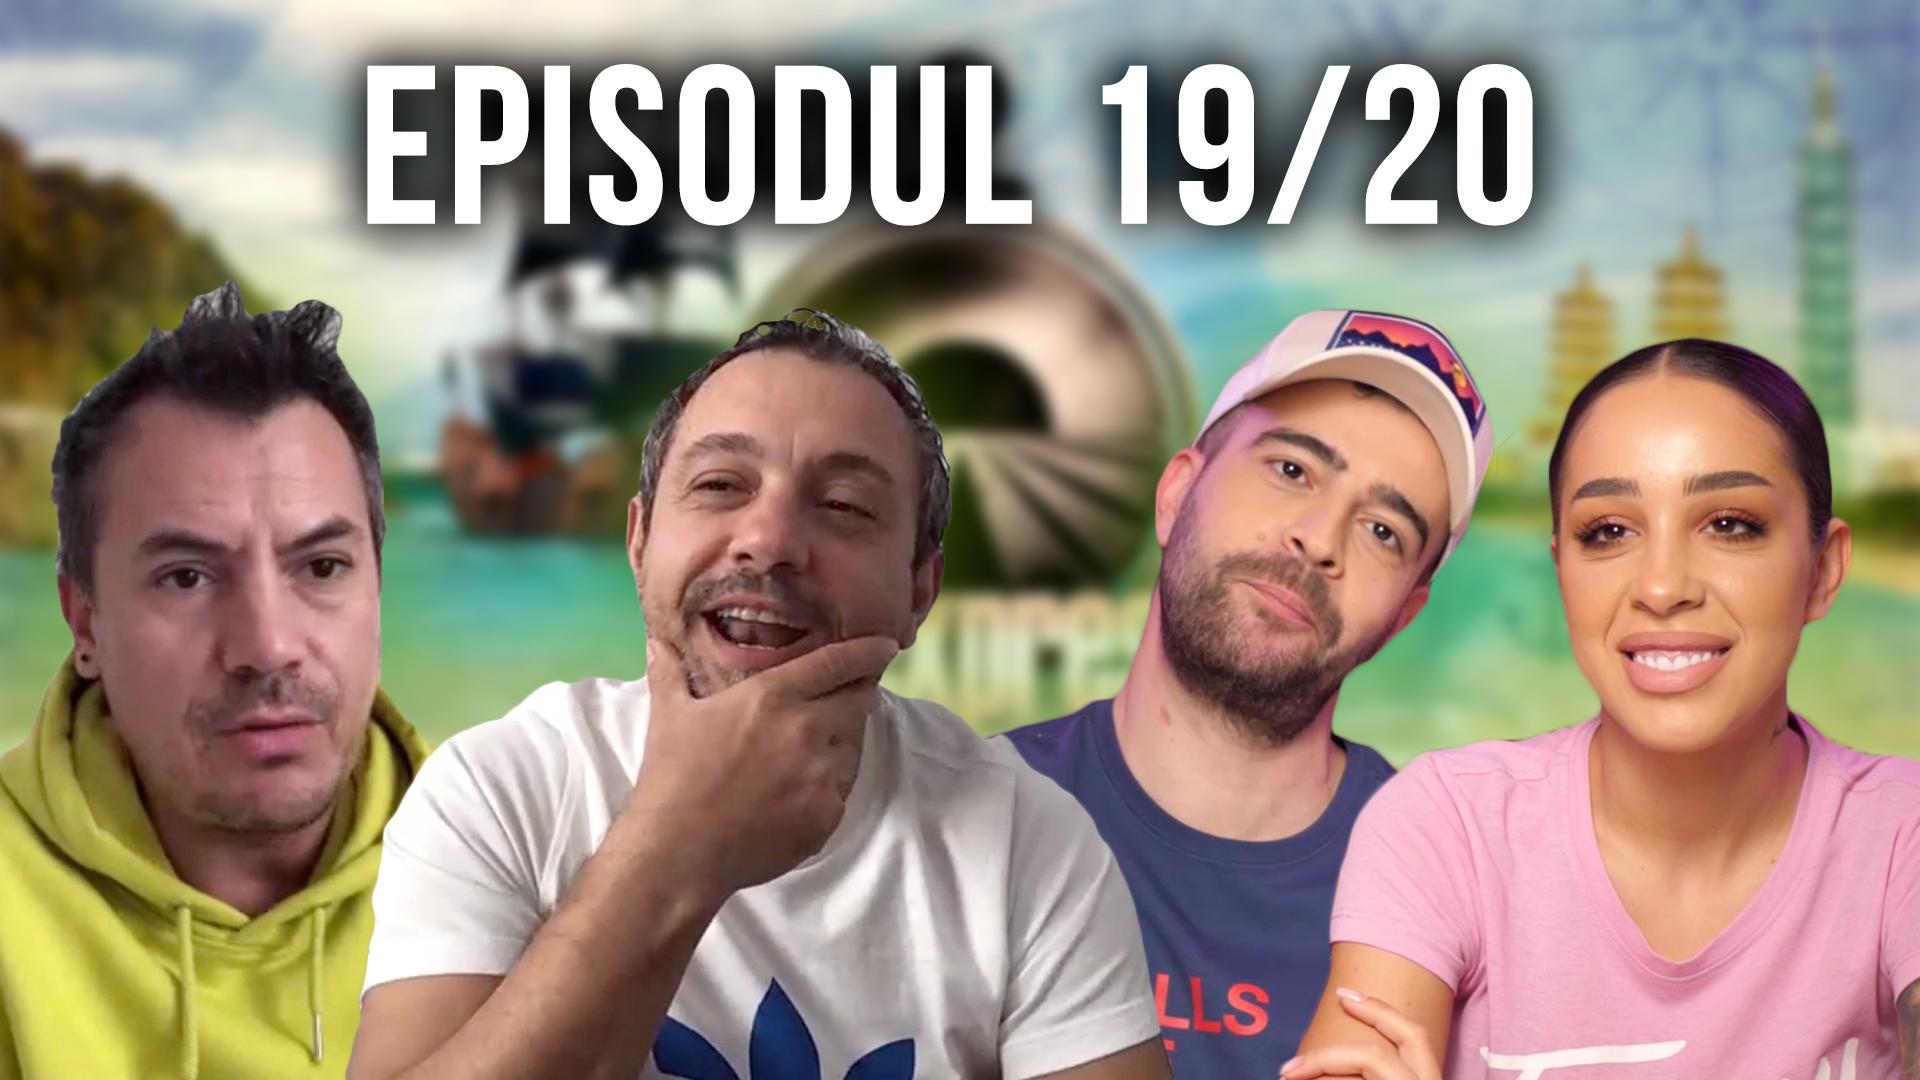 DE SPEAK Firu-n Patru - Episodul 19/20 cu Sorin Bontea și Răzvan Fodor